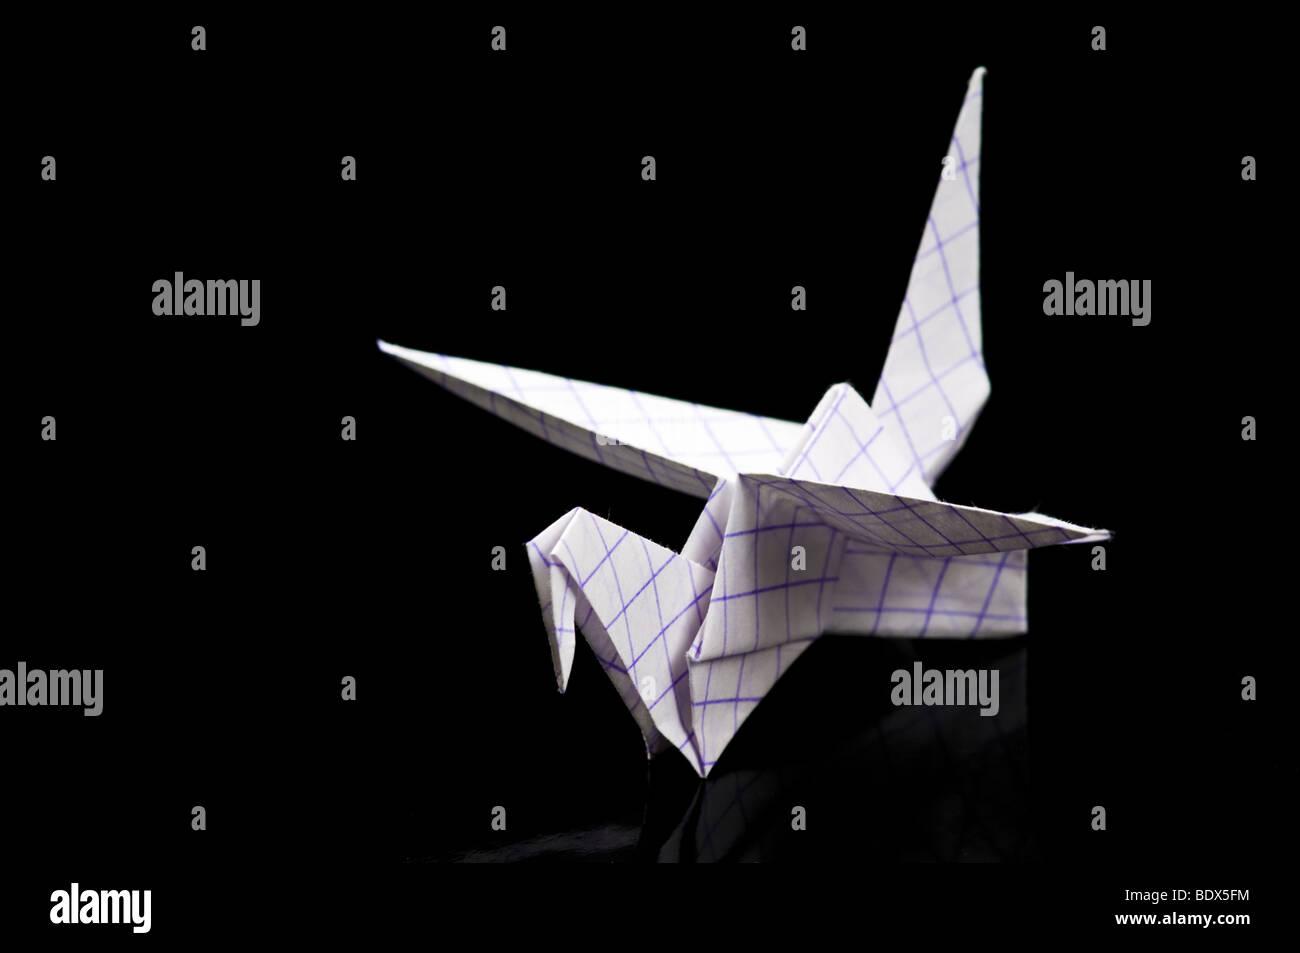 Ein Origami-Papier-Kran über schwarz Stockbild